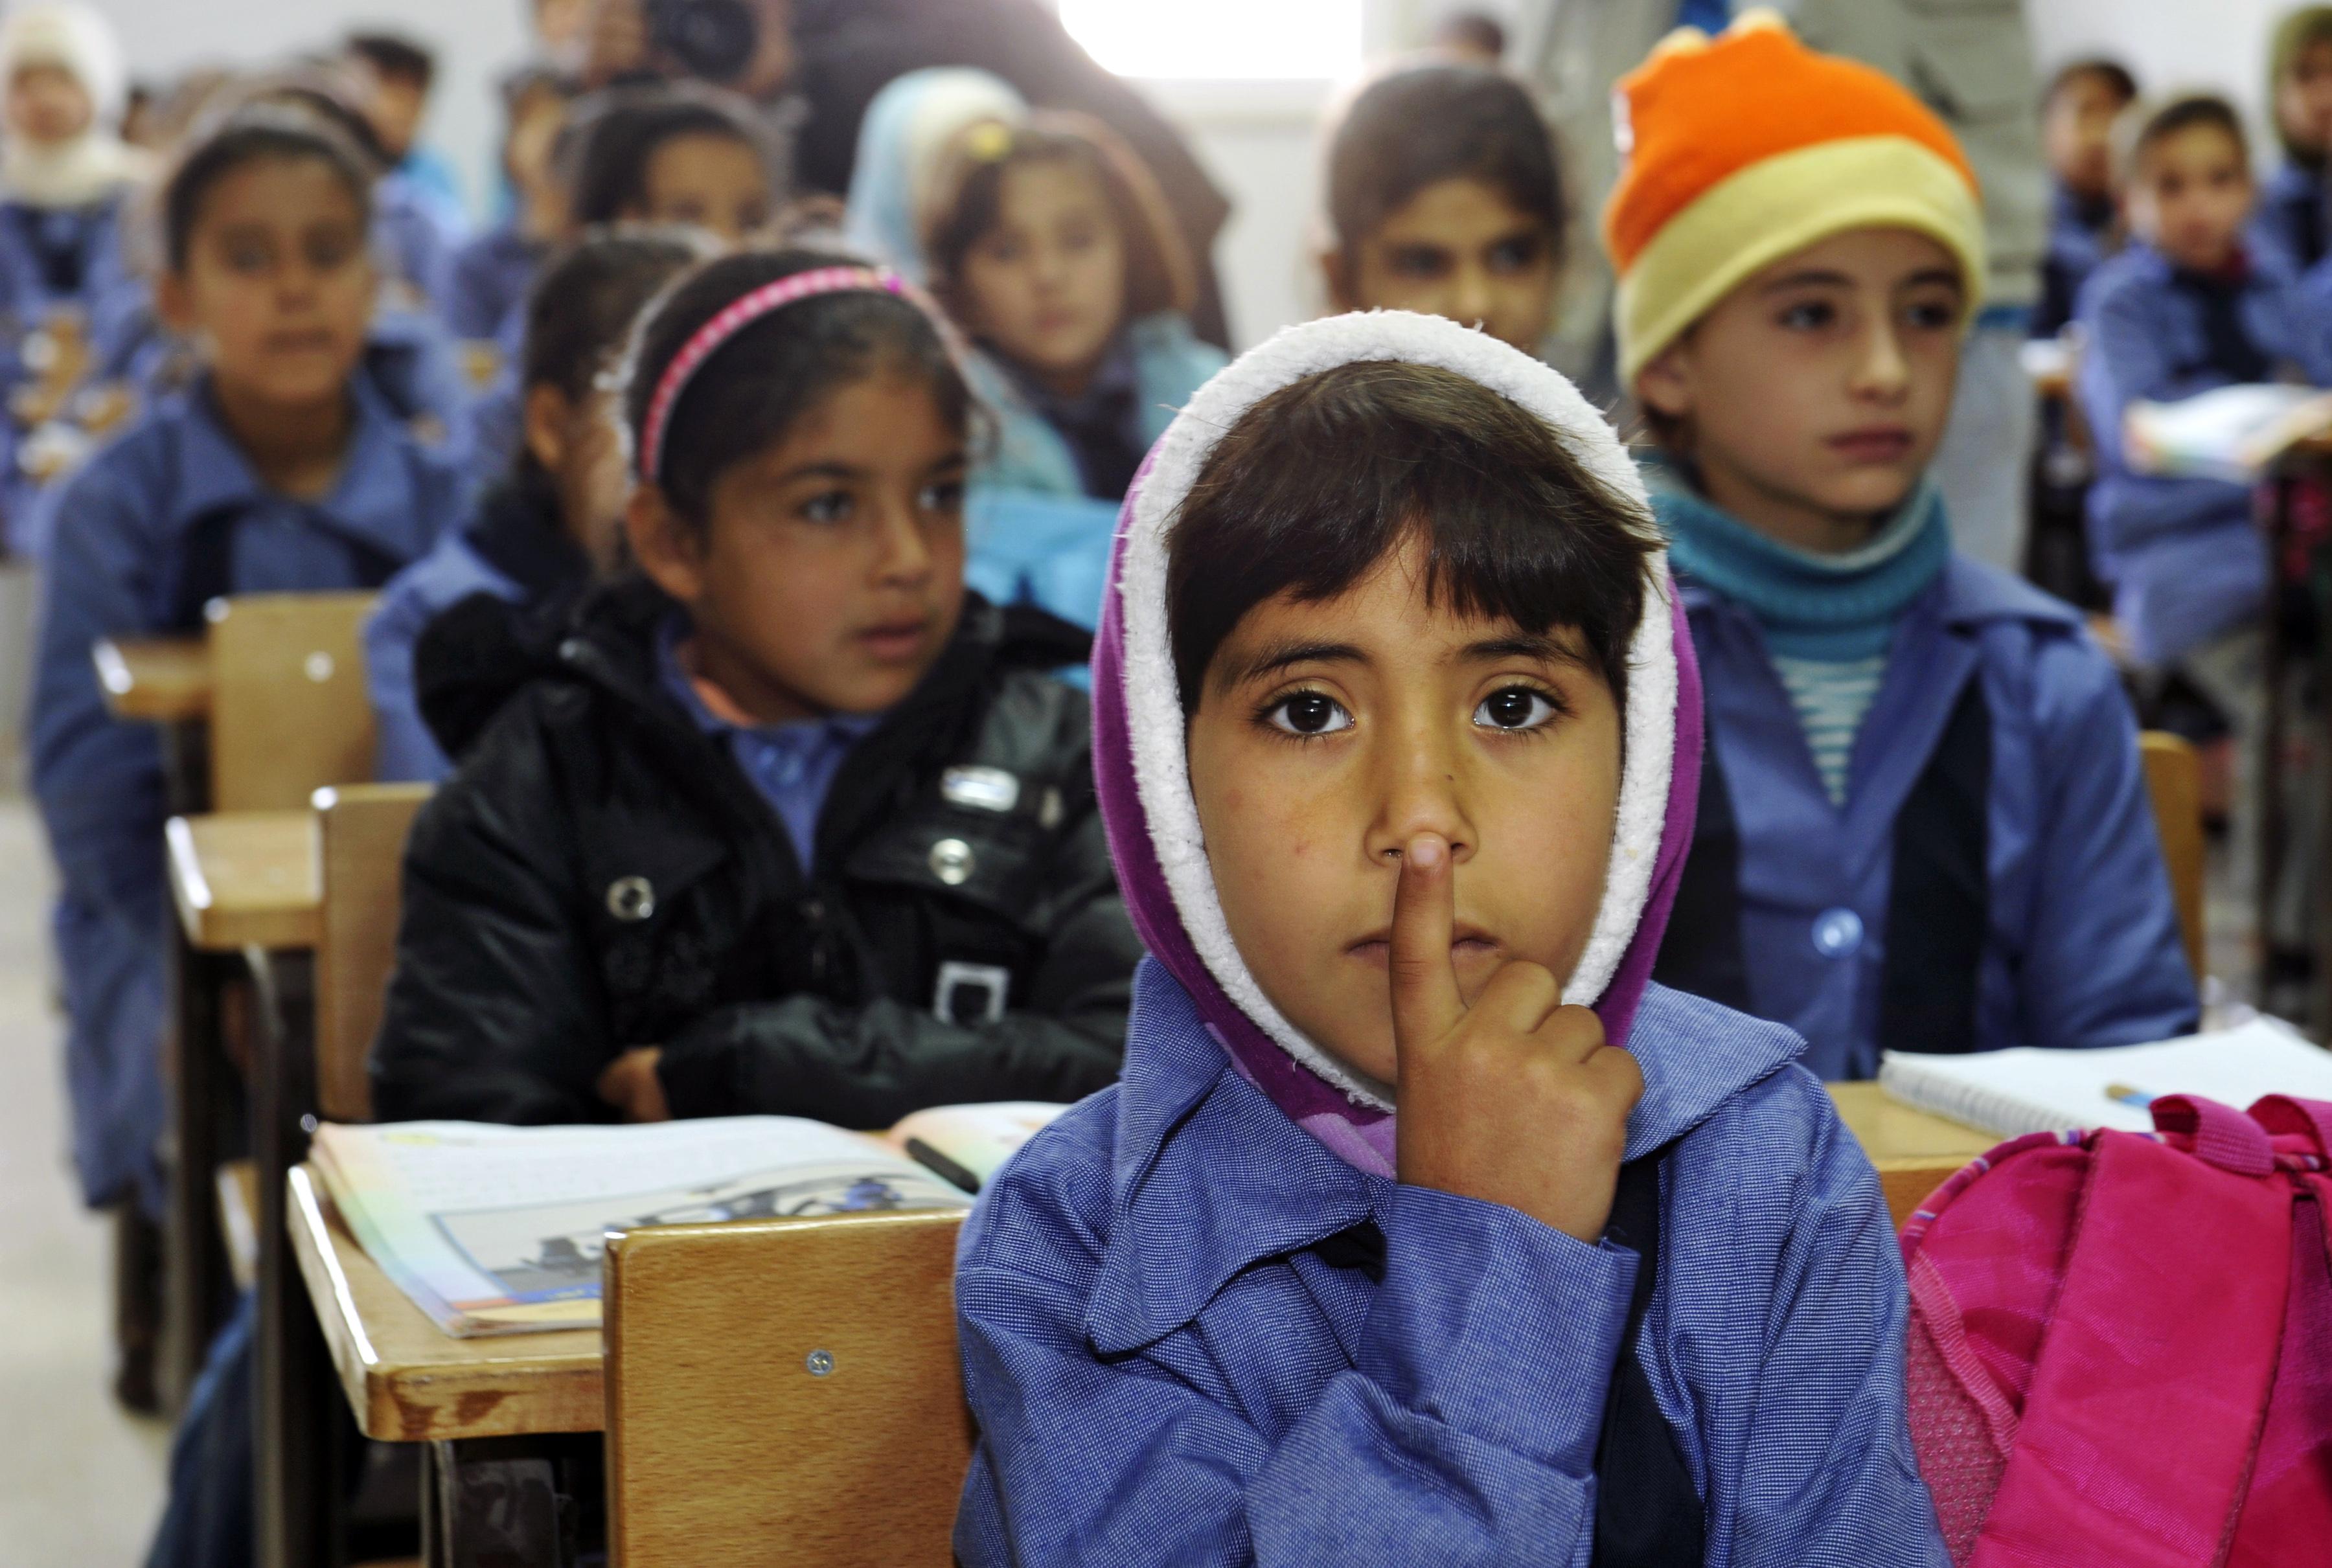 Children sit in a classroom at Zaatri refugee camp near Mafraq, Jordan. (Photo courtesy of United Nations Photo